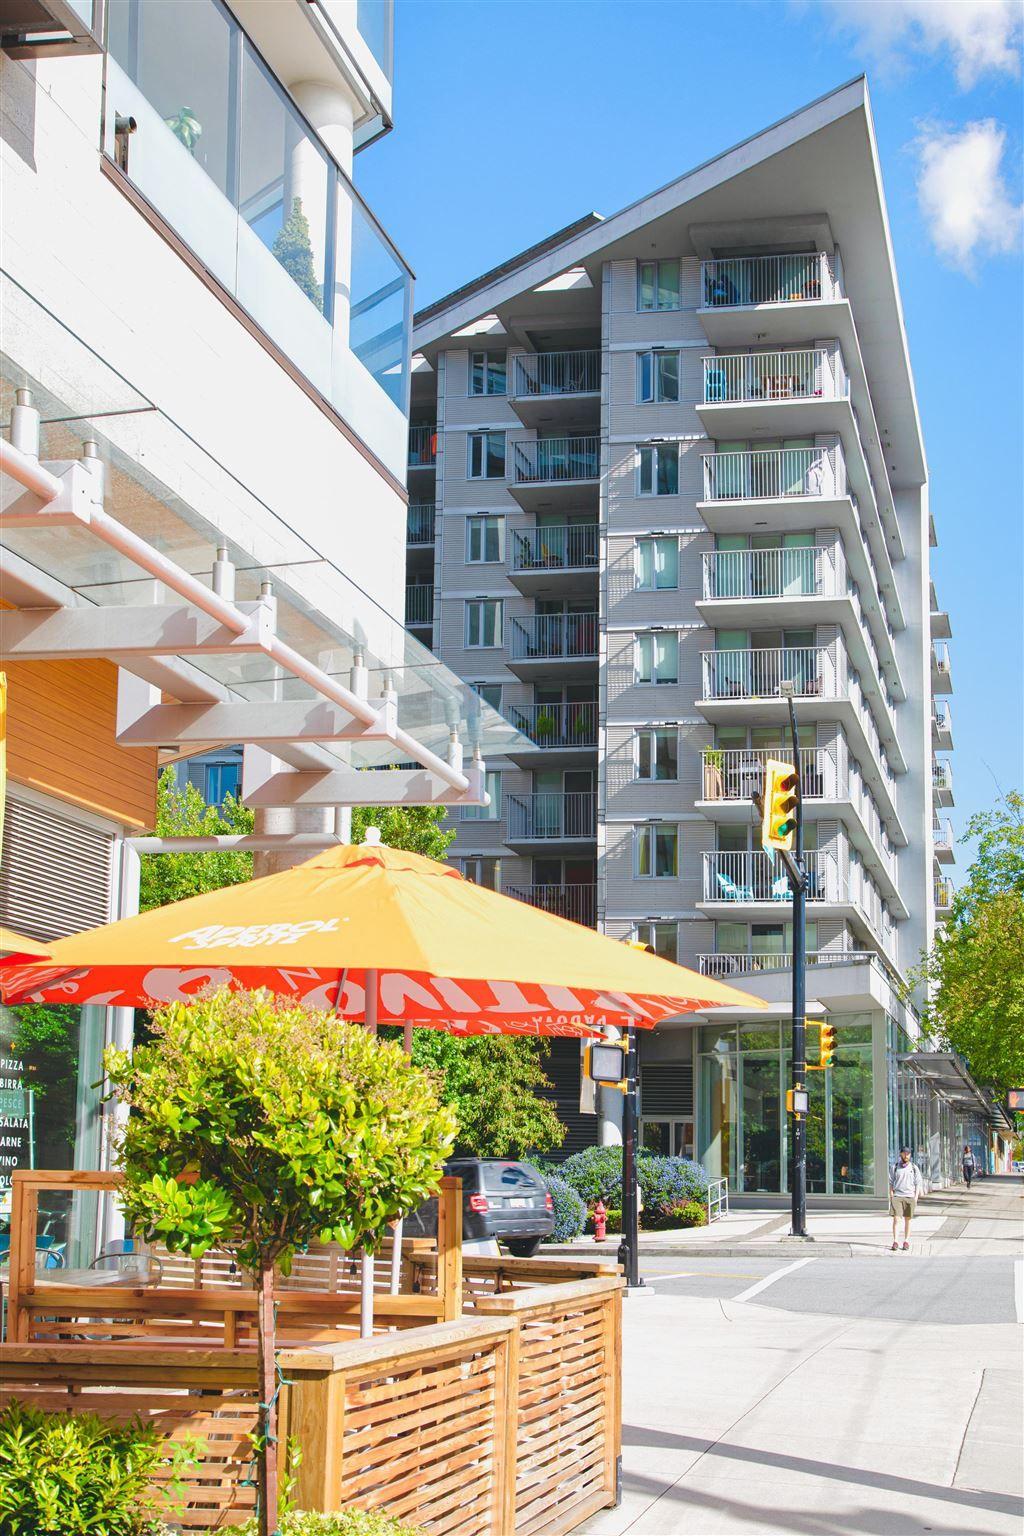 Main Photo: 318 328 E 11TH Avenue in Vancouver: Mount Pleasant VE Condo for sale (Vancouver East)  : MLS®# R2594200